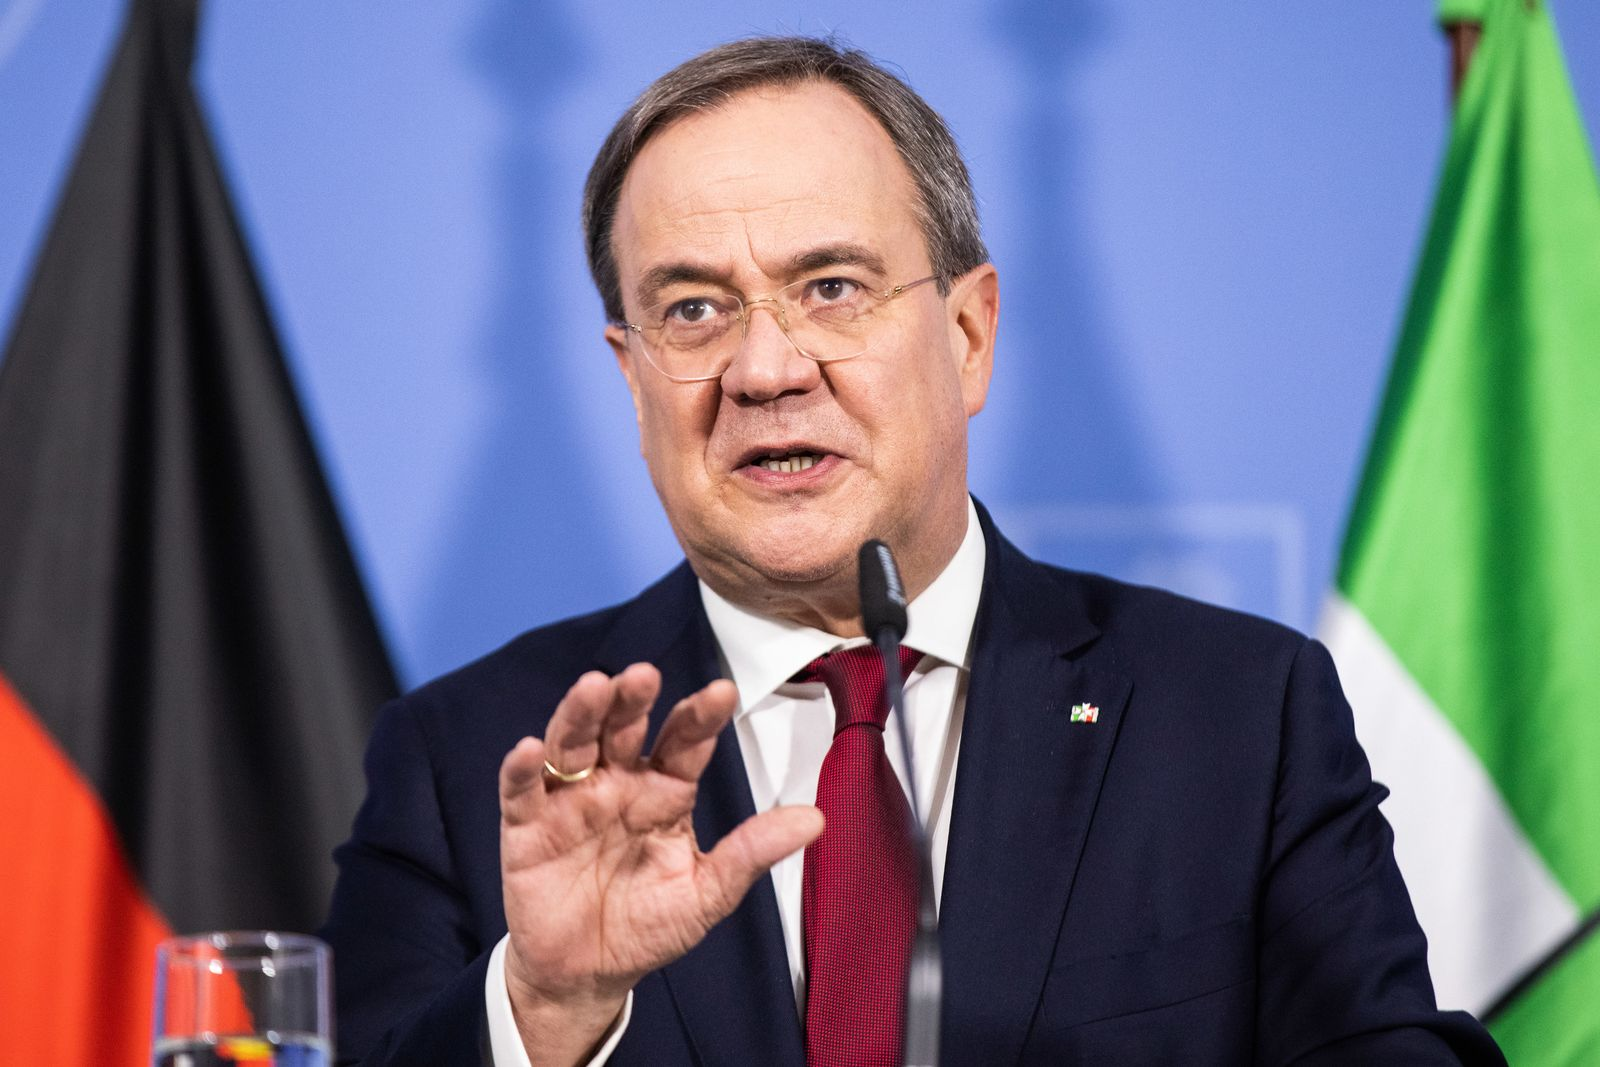 Ministerpräsident Laschet fordert neue Corona-Konzepte